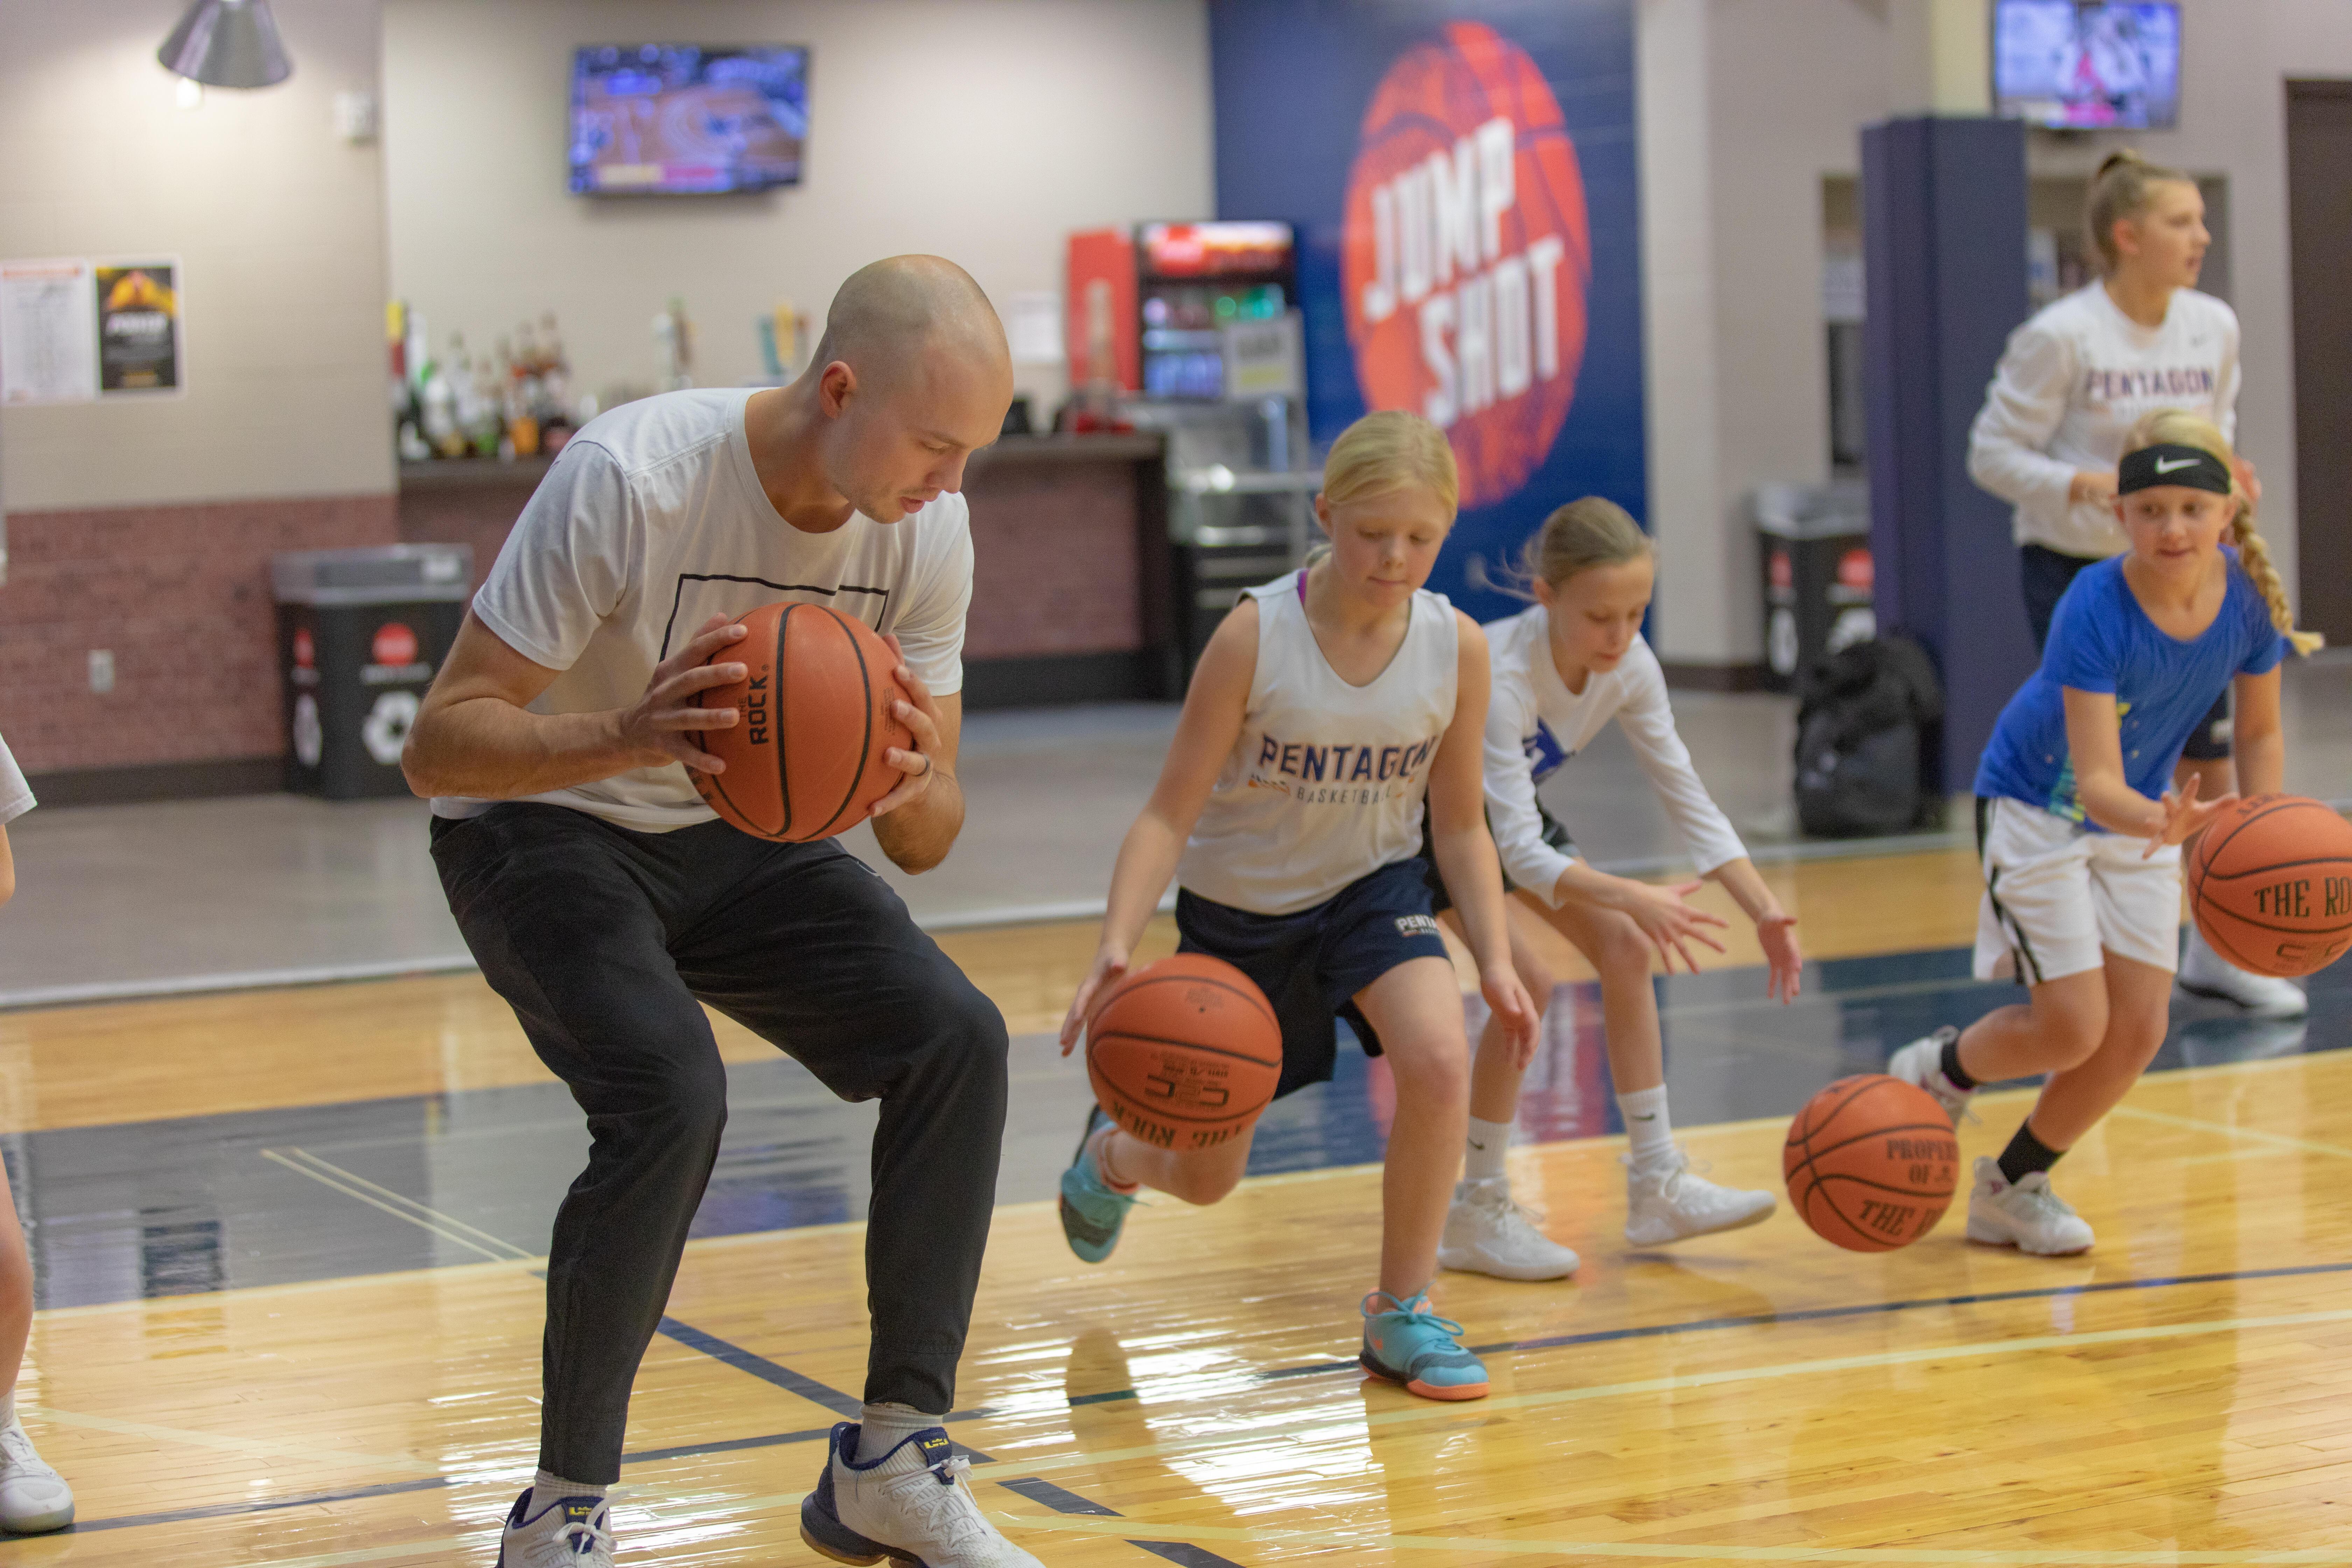 Sanford POWER Basketball agility drill